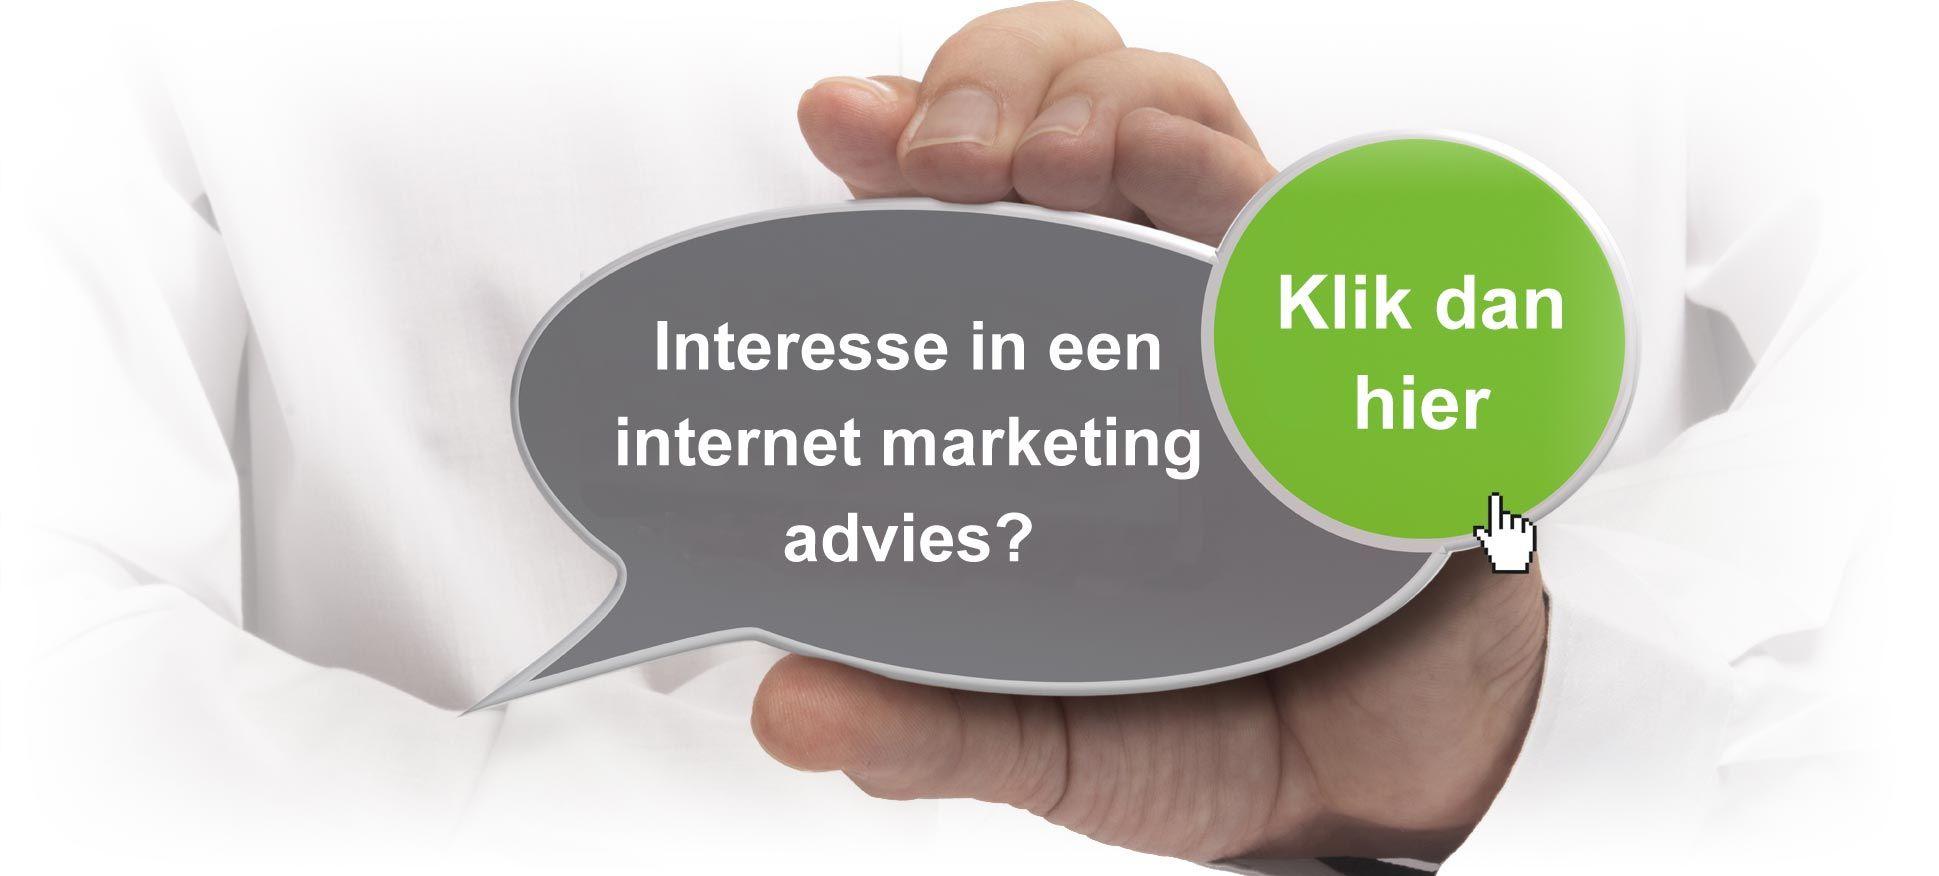 ervaring met doors internet marketing